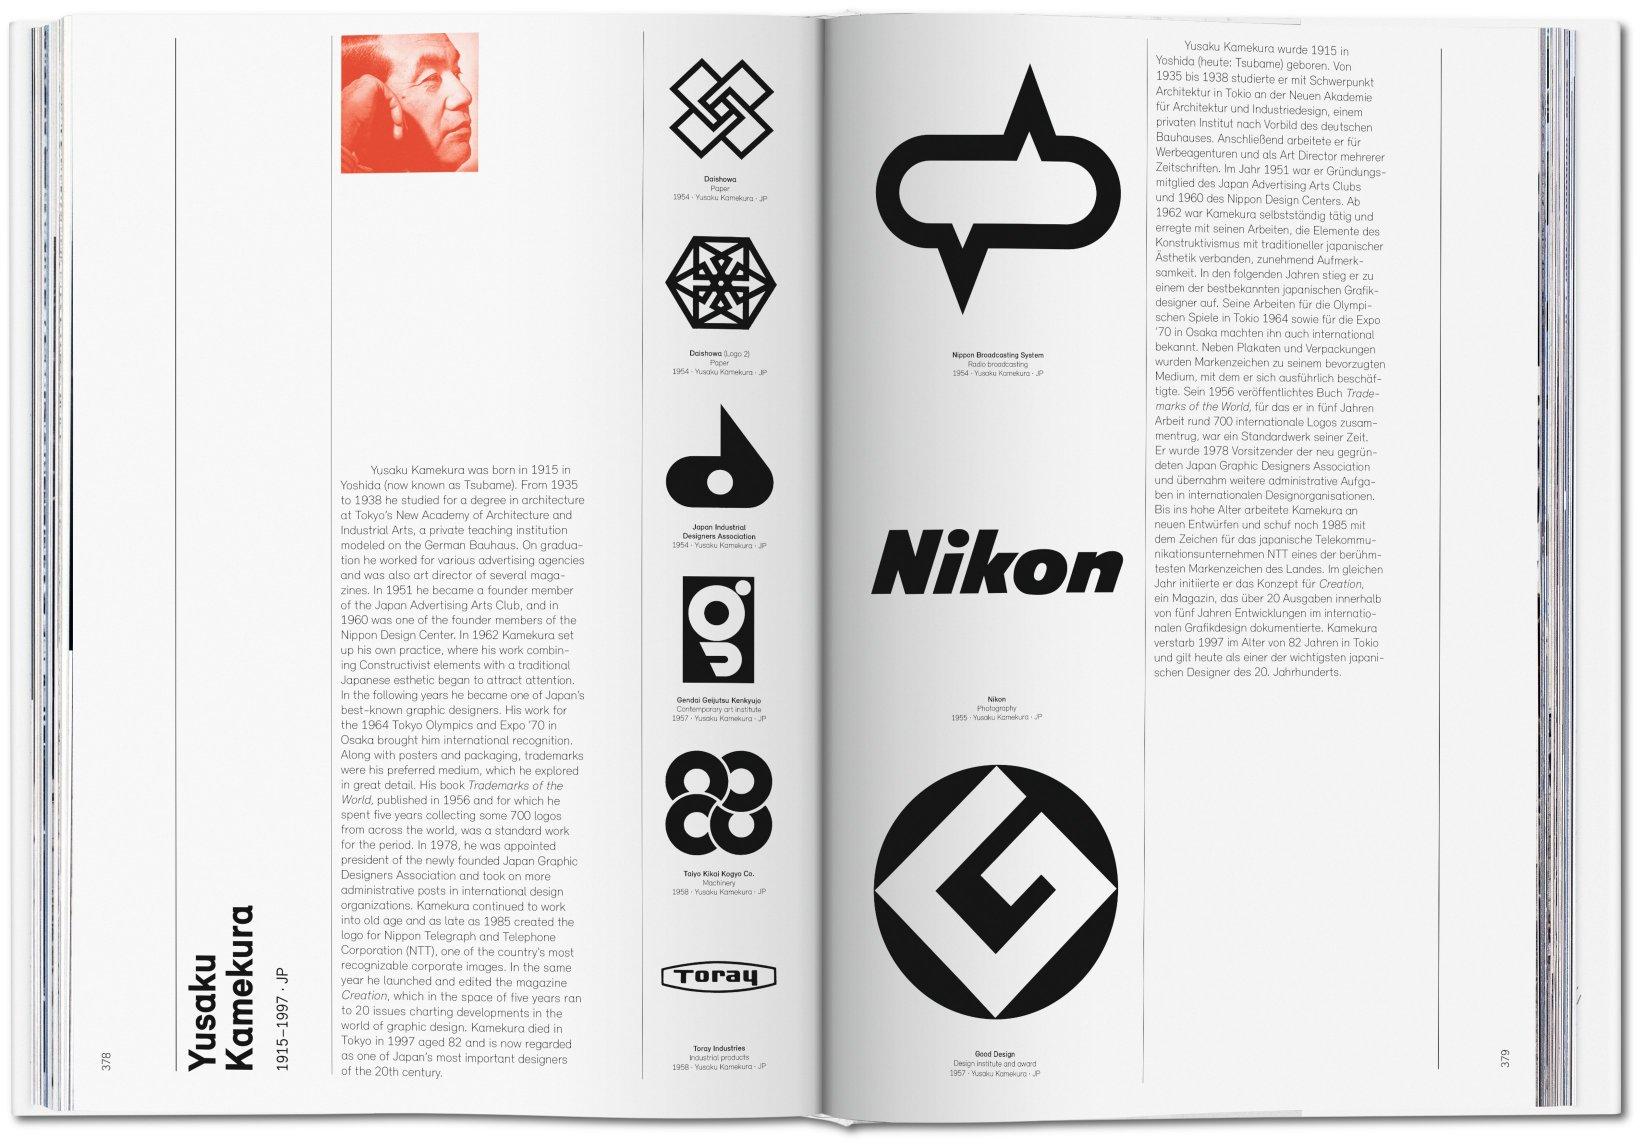 logo_modernism_ju_int_open_0378_0379_02879_1509101010_id_995147